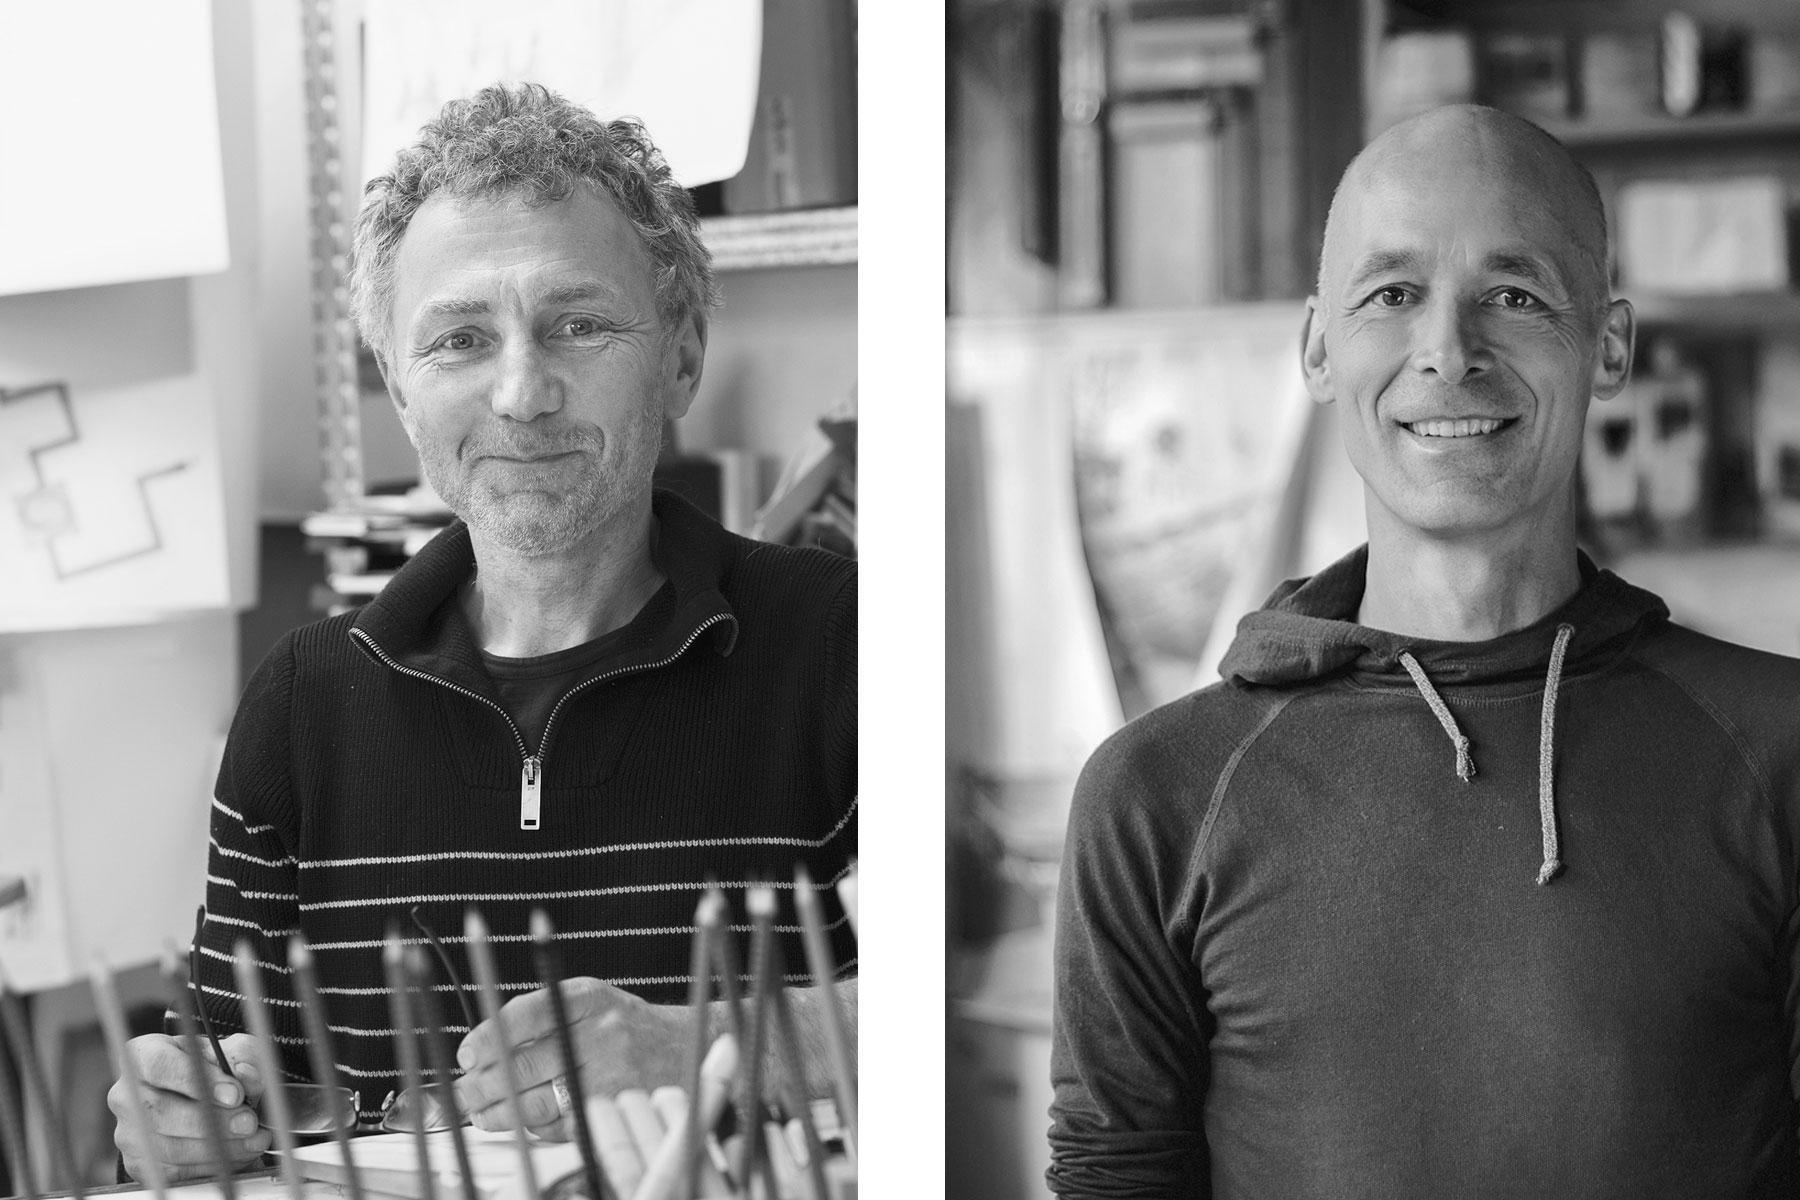 Dipl. Designer Tilman Stachat und Christoph Meusel